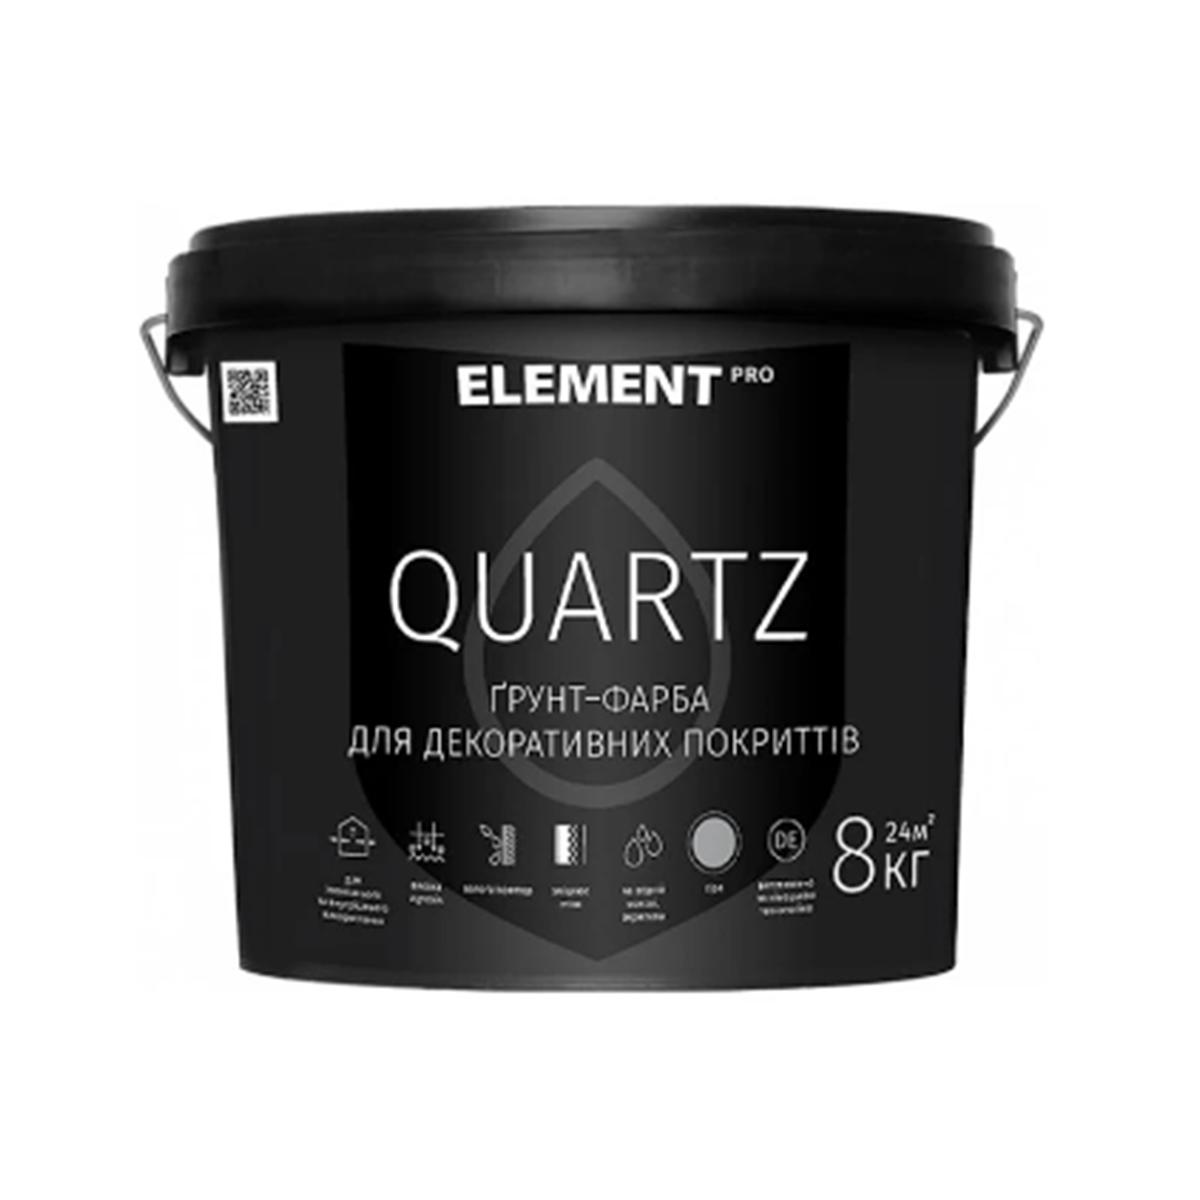 Грунт-фарба Element Pro Quartz білий 8кг